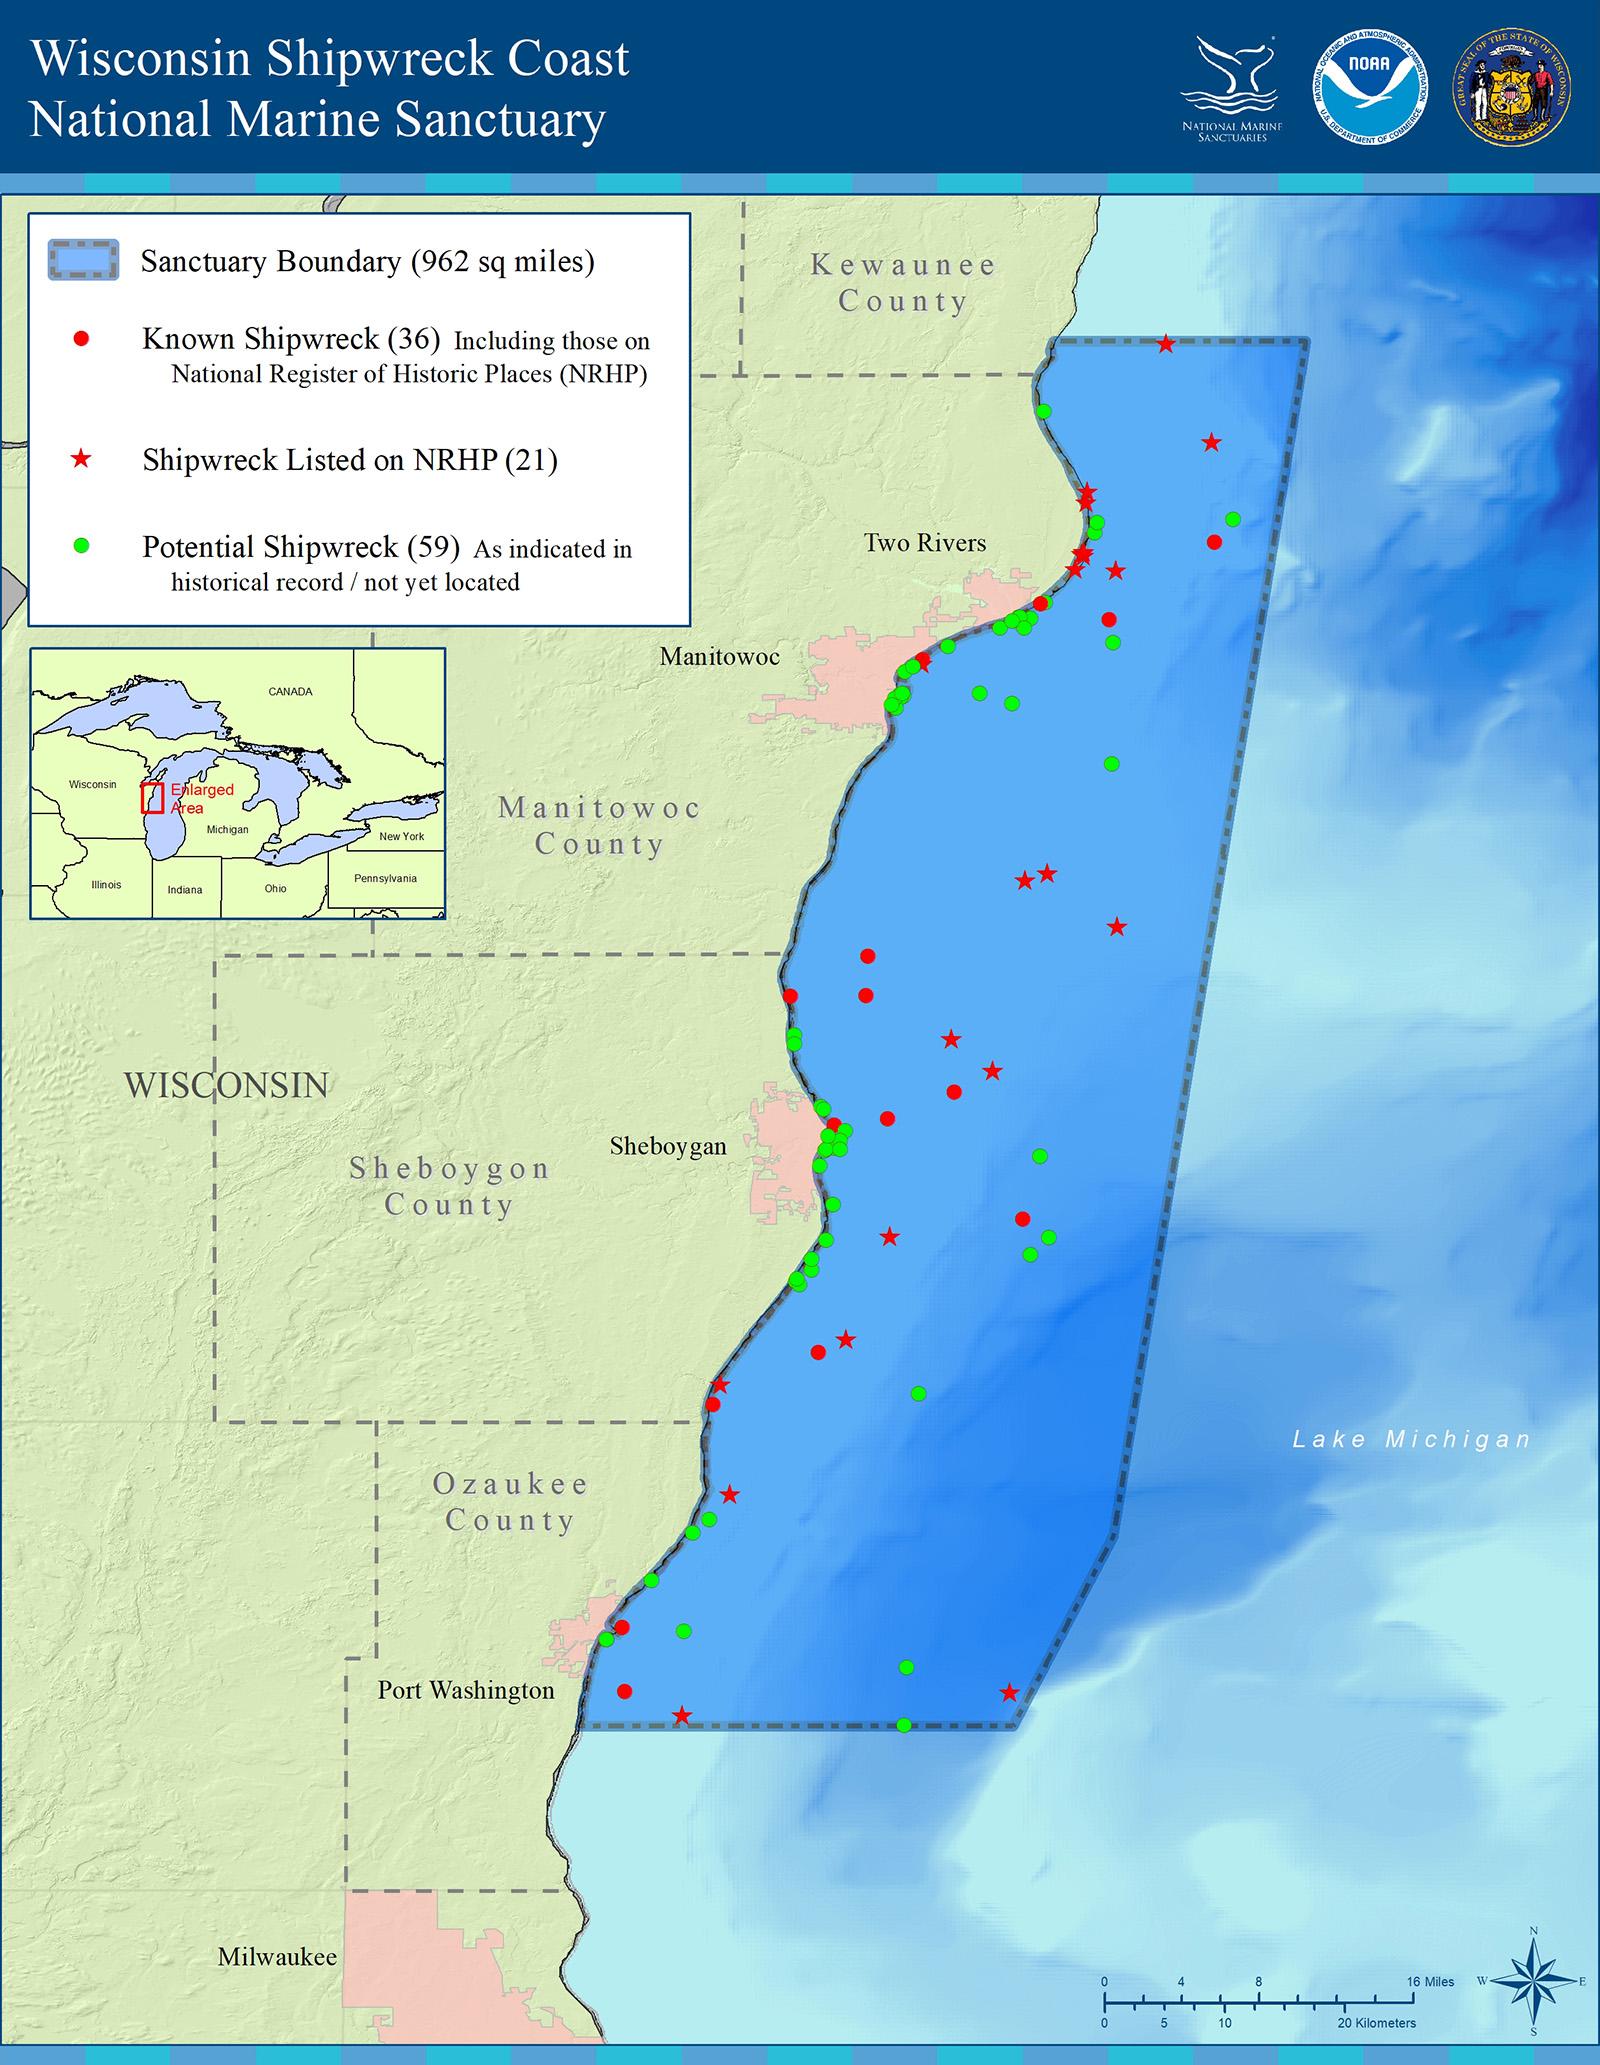 Map of Wisconsin Shipwreck Coast National Marine Sanctuary